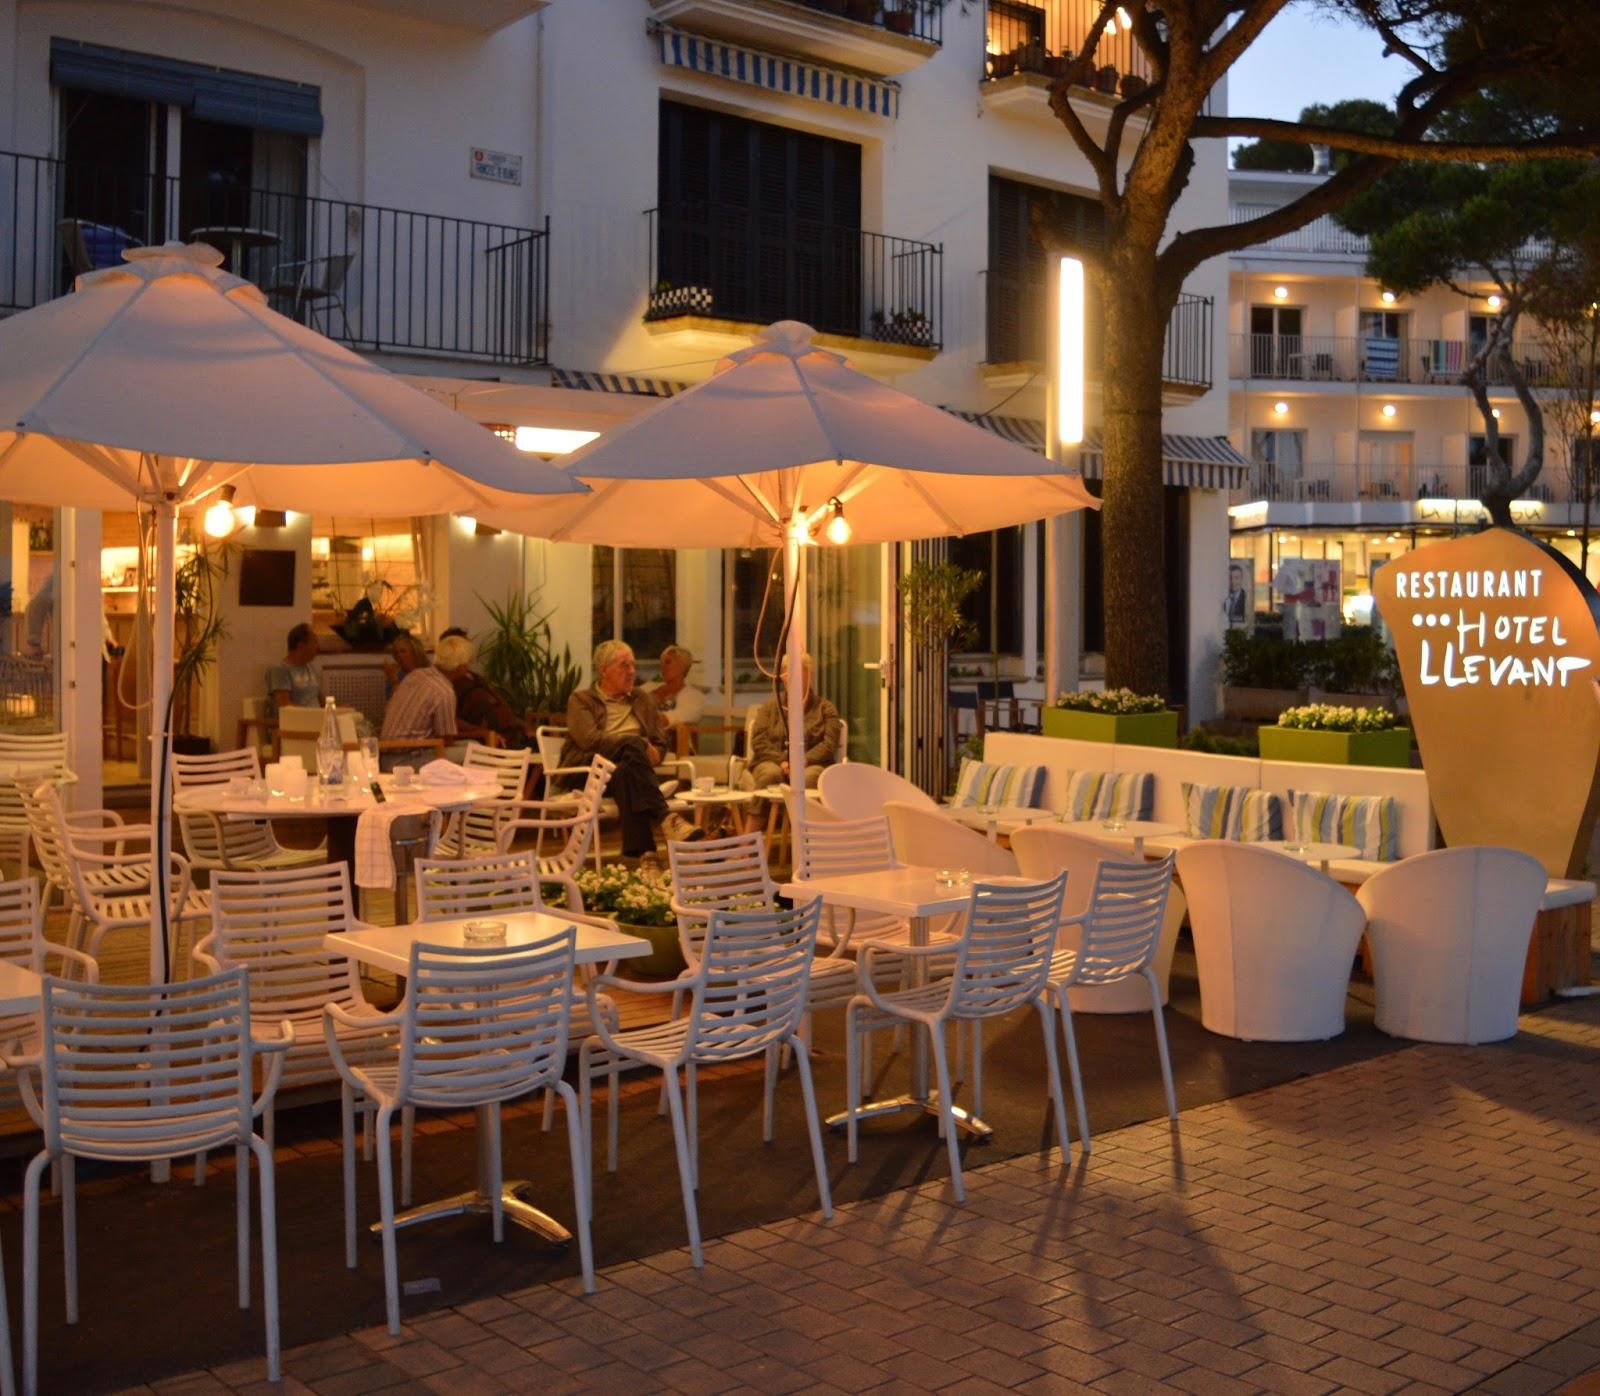 A walk from Calella de Palafrugell to Llafranc - Hotel LLevant